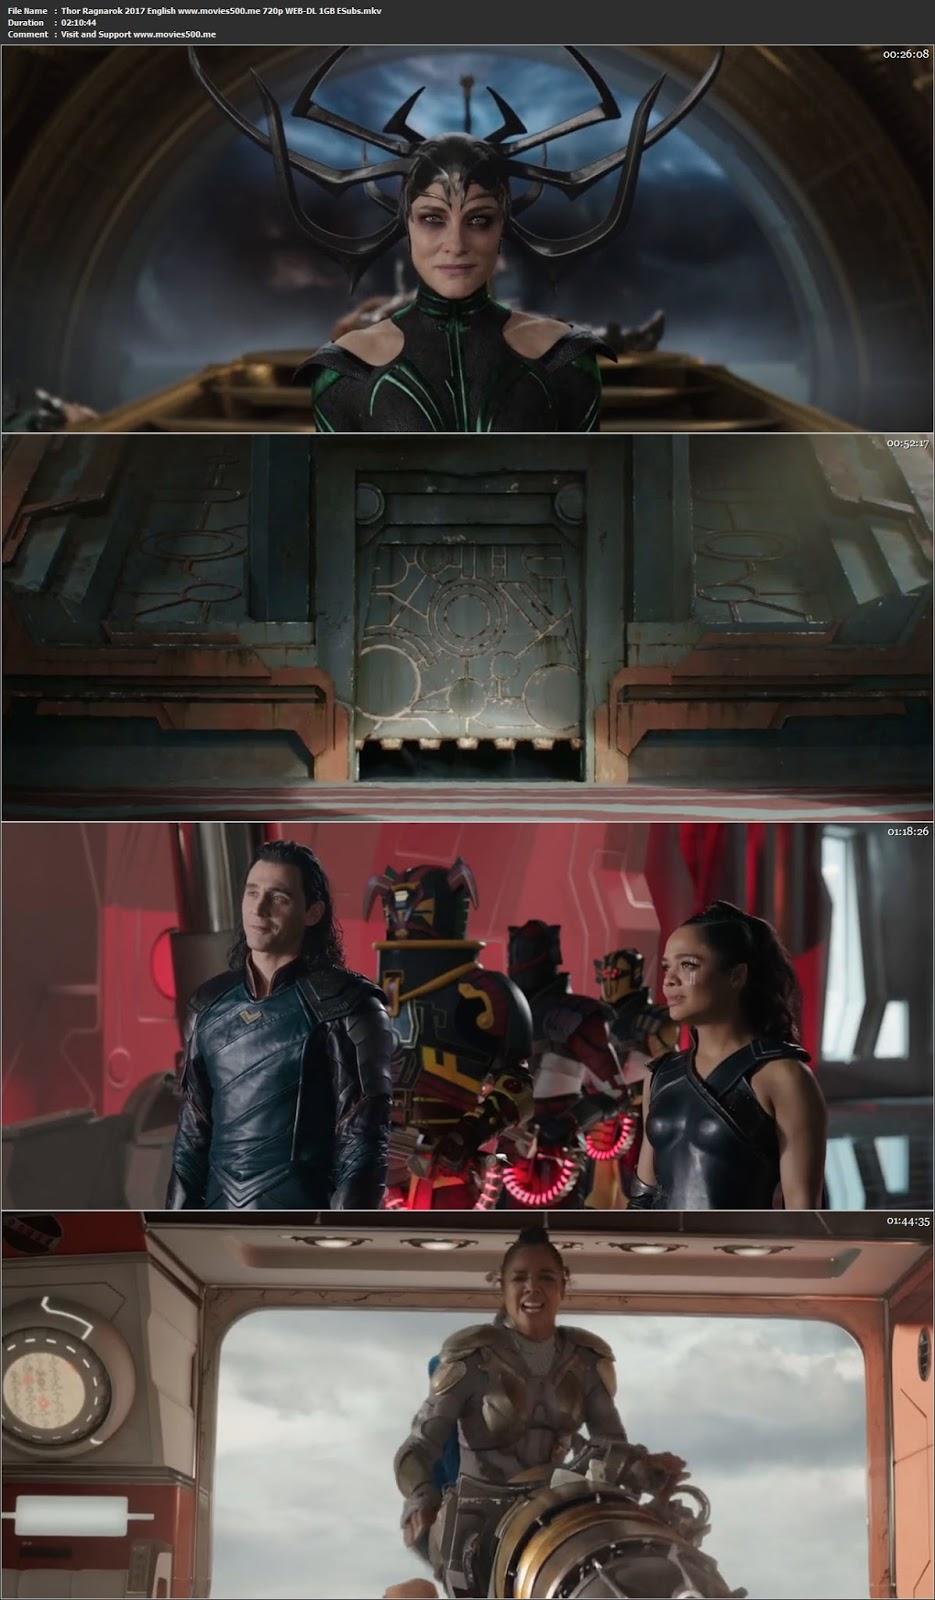 Thor Ragnarok 2017 Dual Audio Hind Movie WEB DL 720p 1GB at movies500.xyz